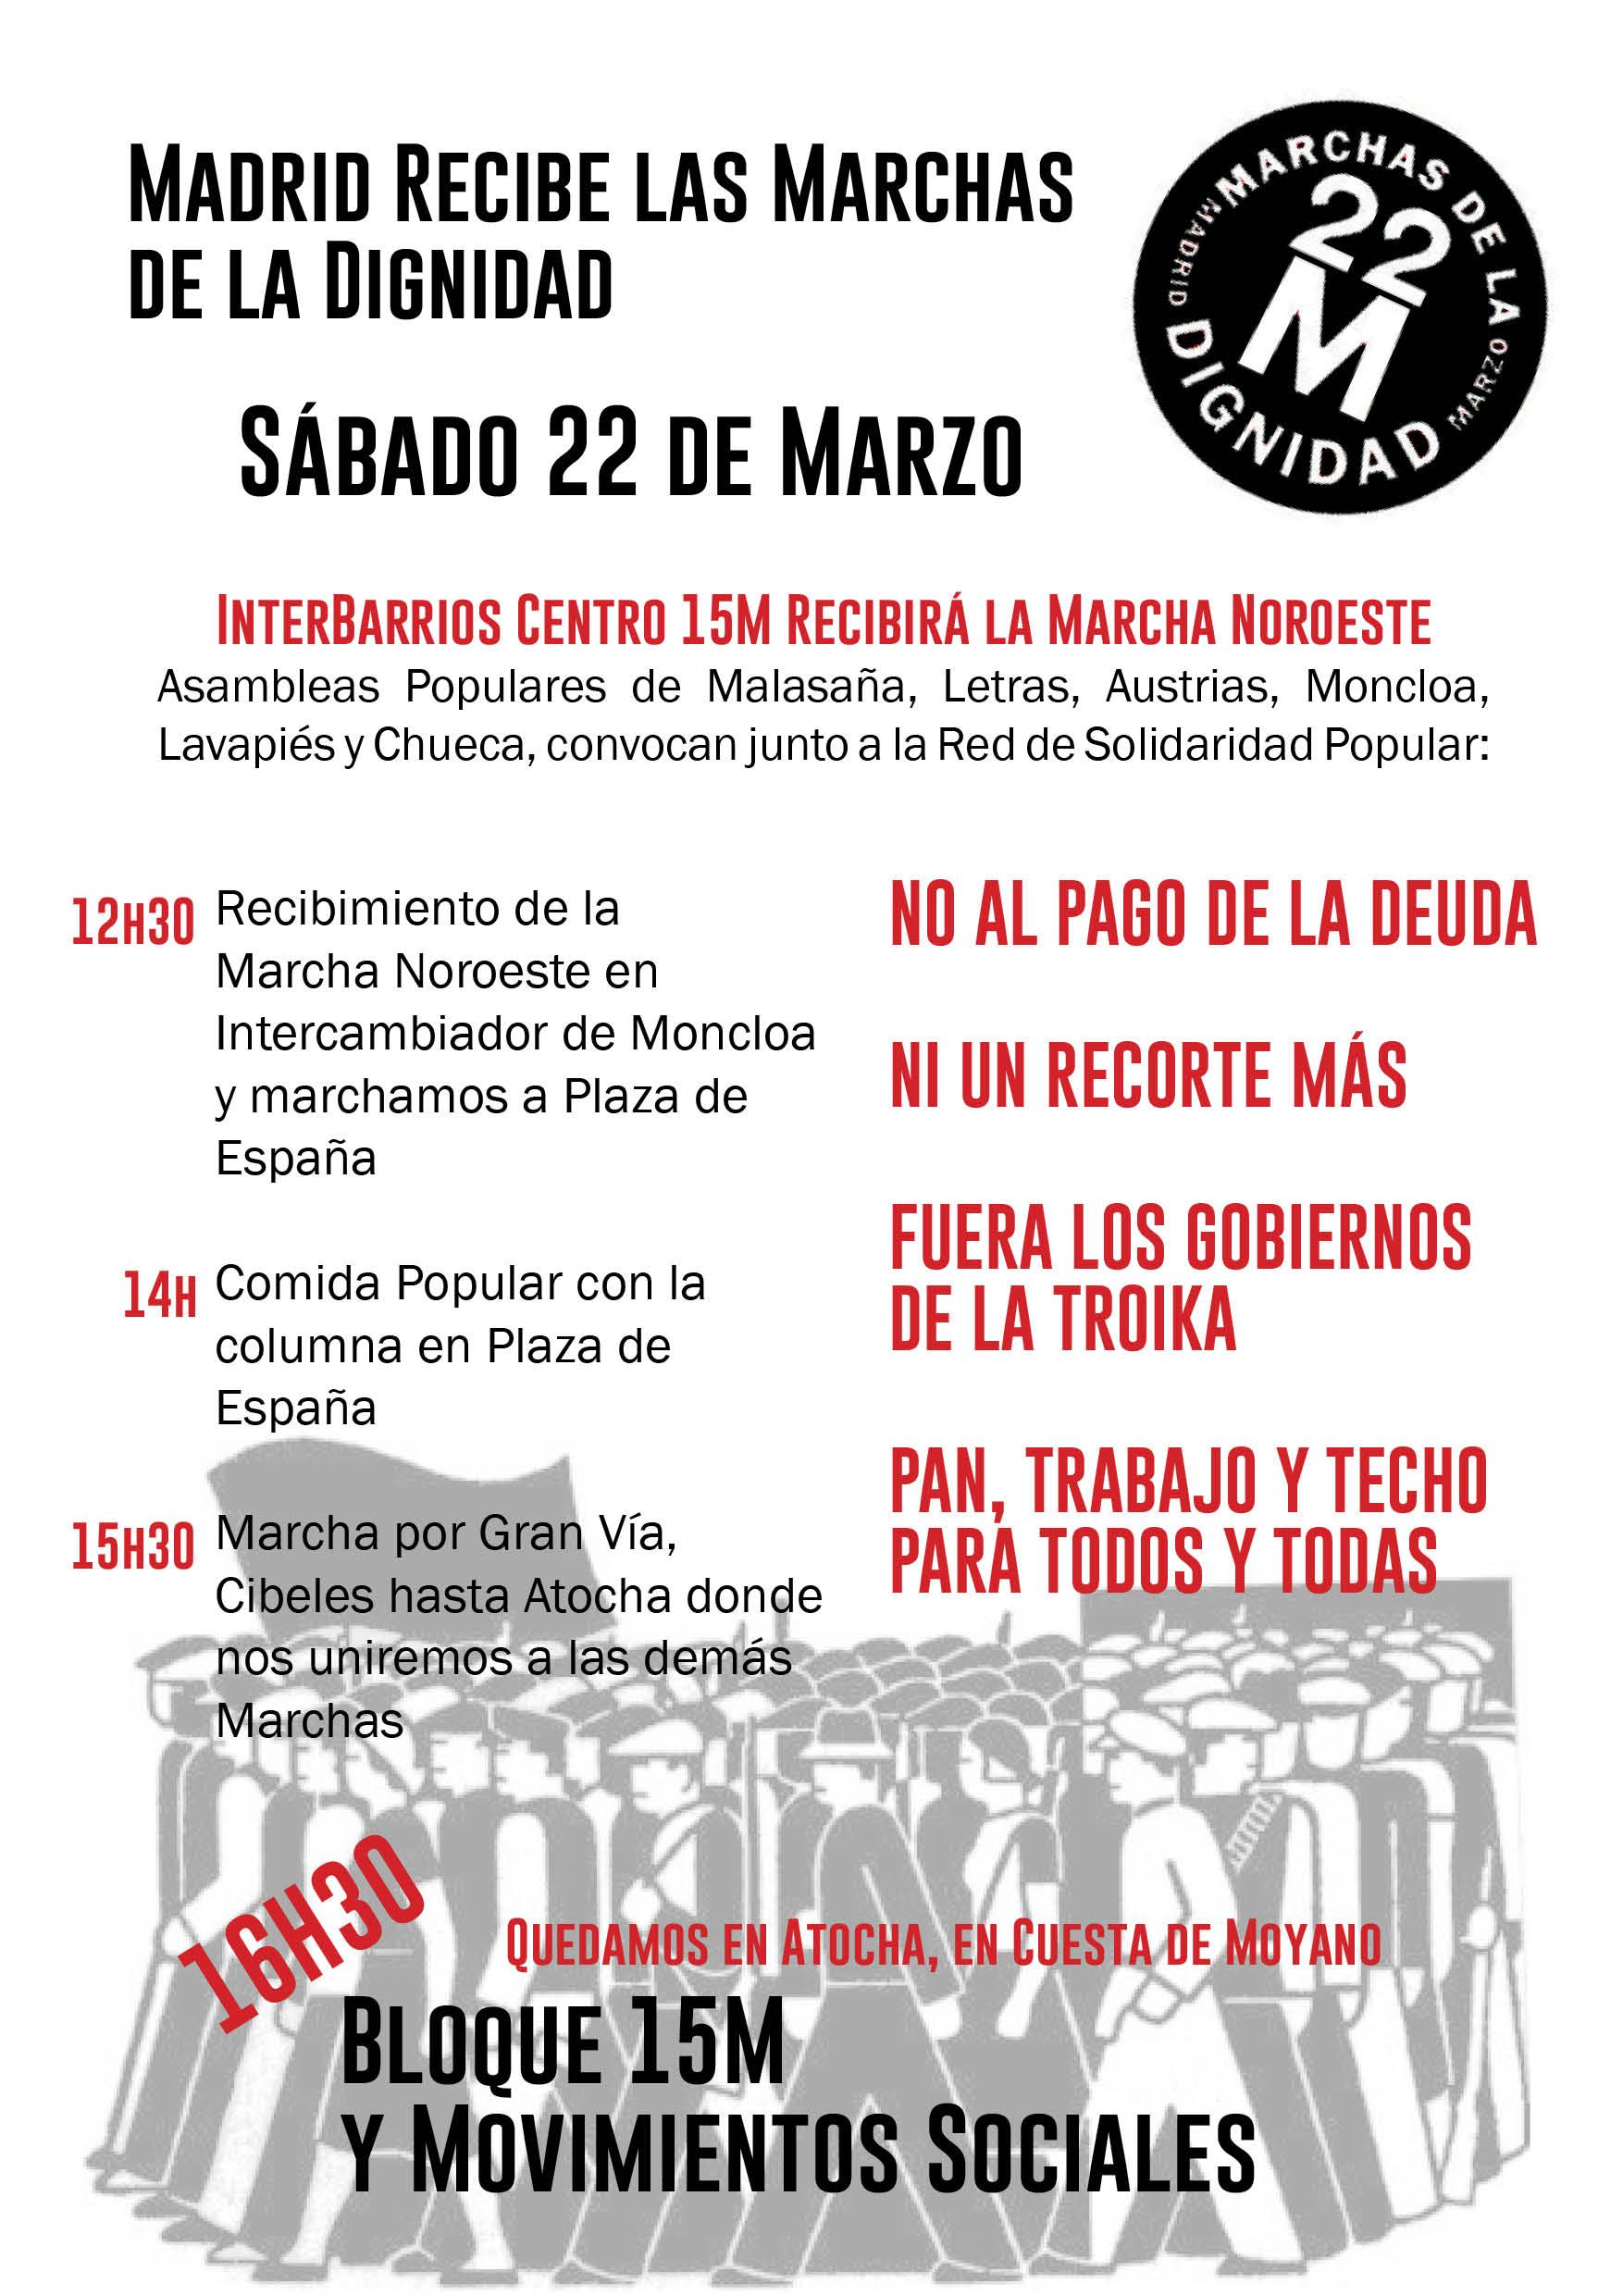 marchas interbarrios centro